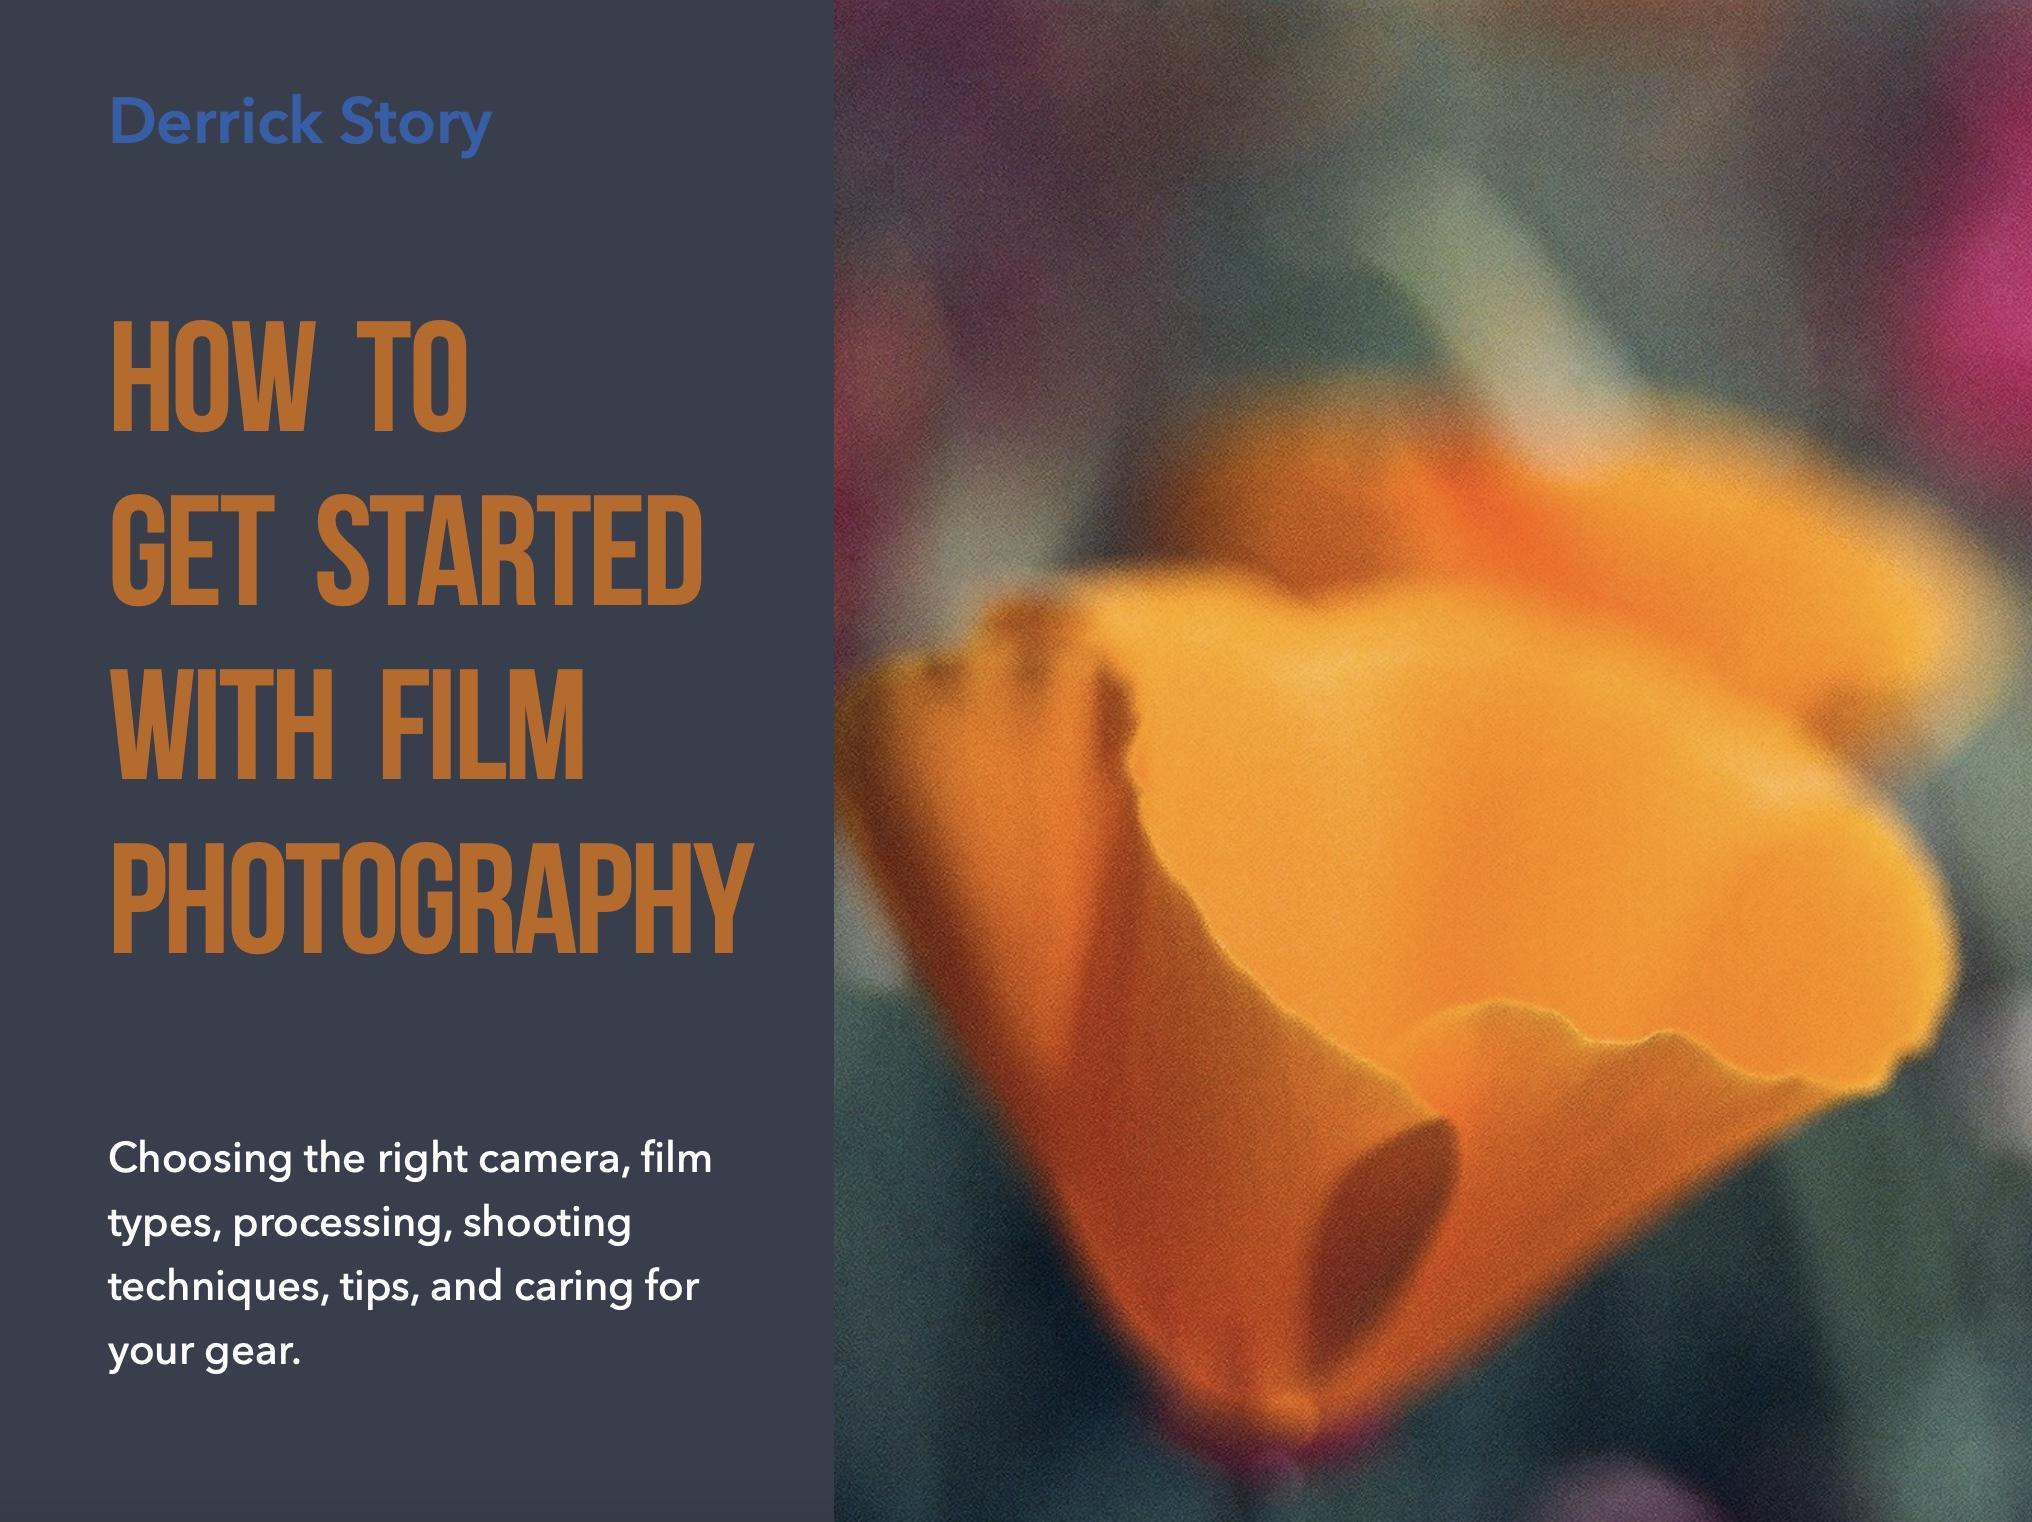 https://thedigitalstory.com/2020/10/13/Film-Photography-Cover.jpg